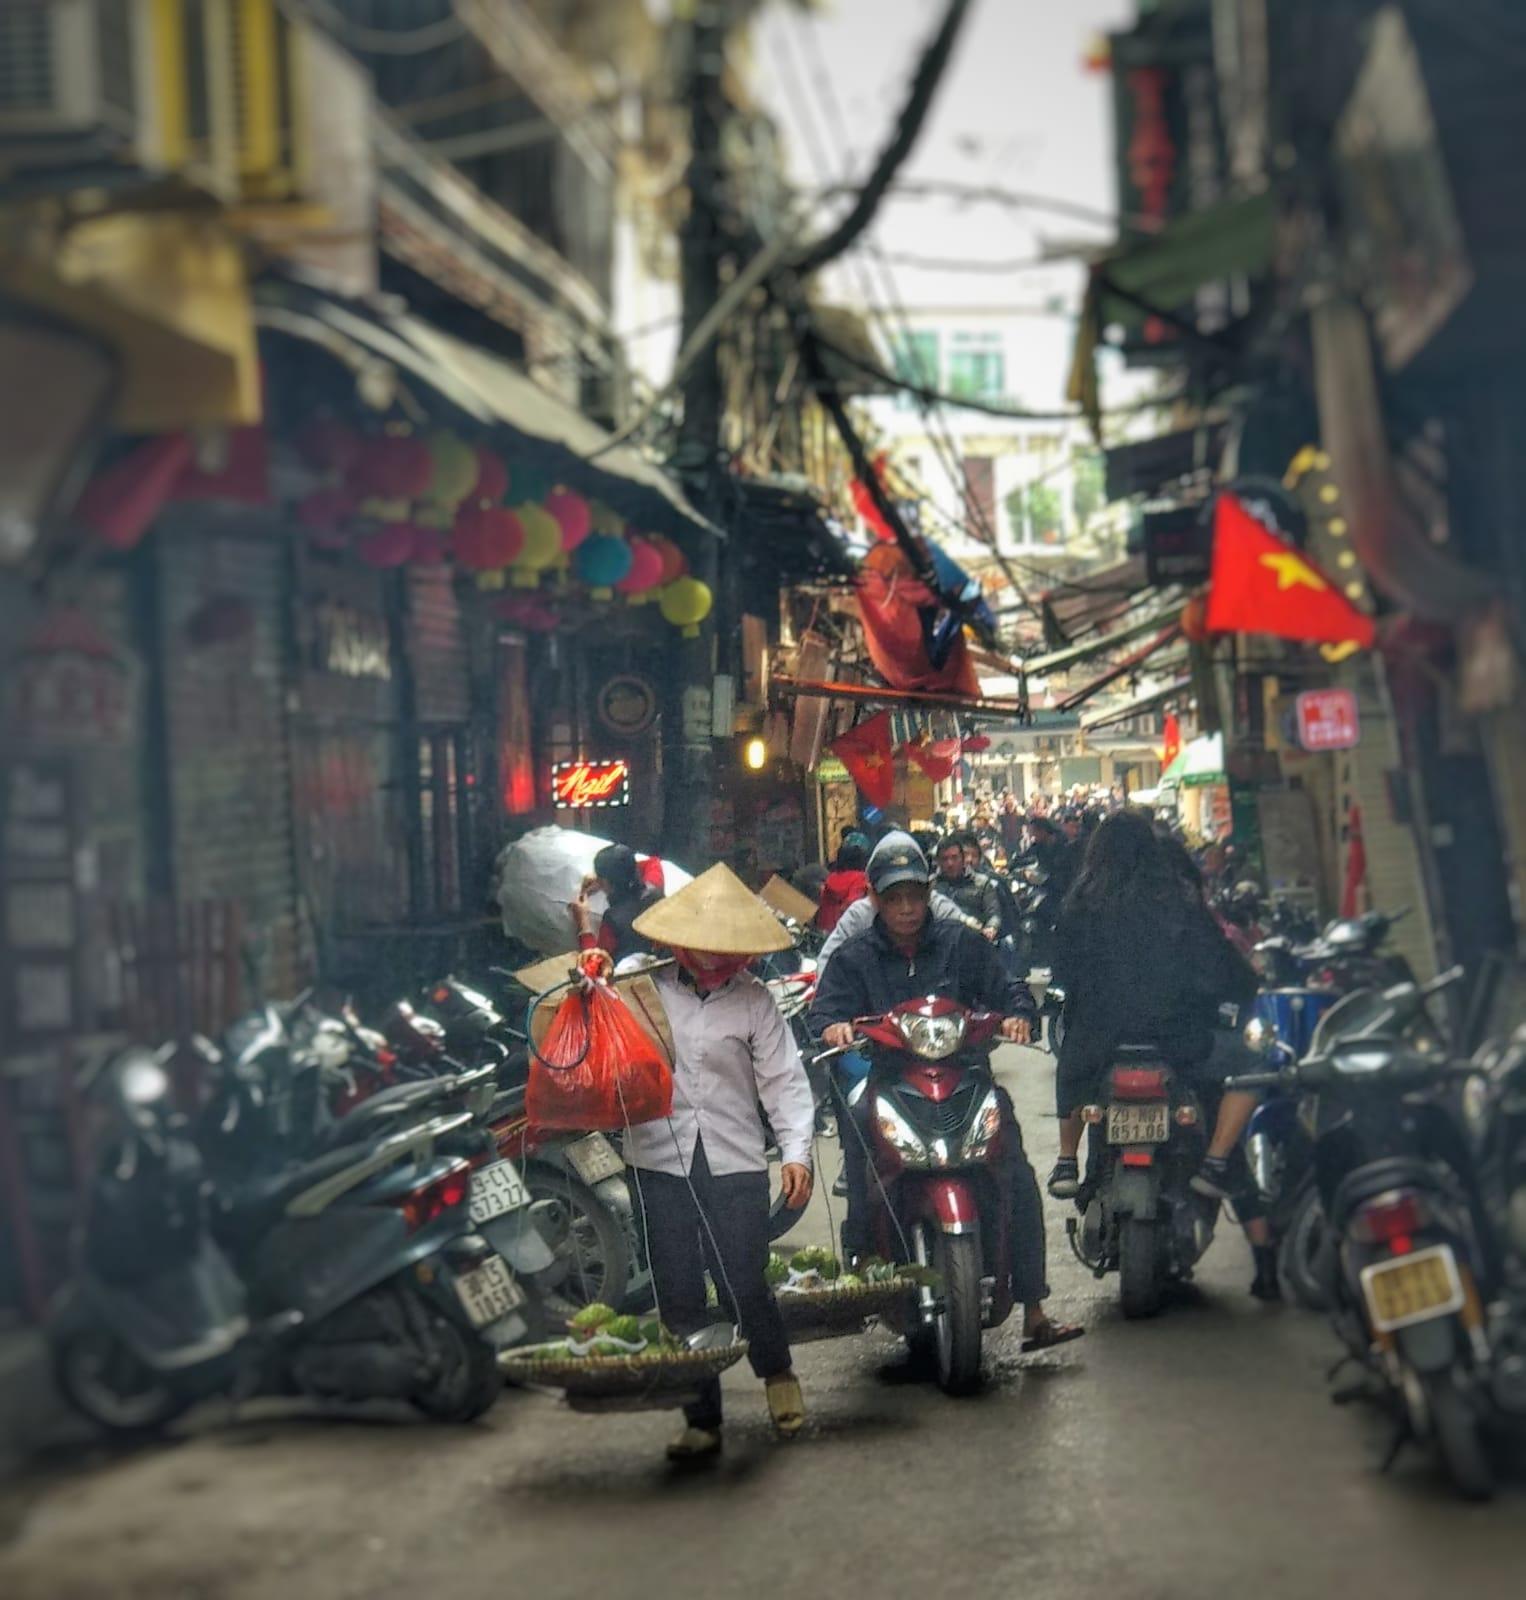 Qué ver en Hanoi - Calle Old Quarter Hanoi